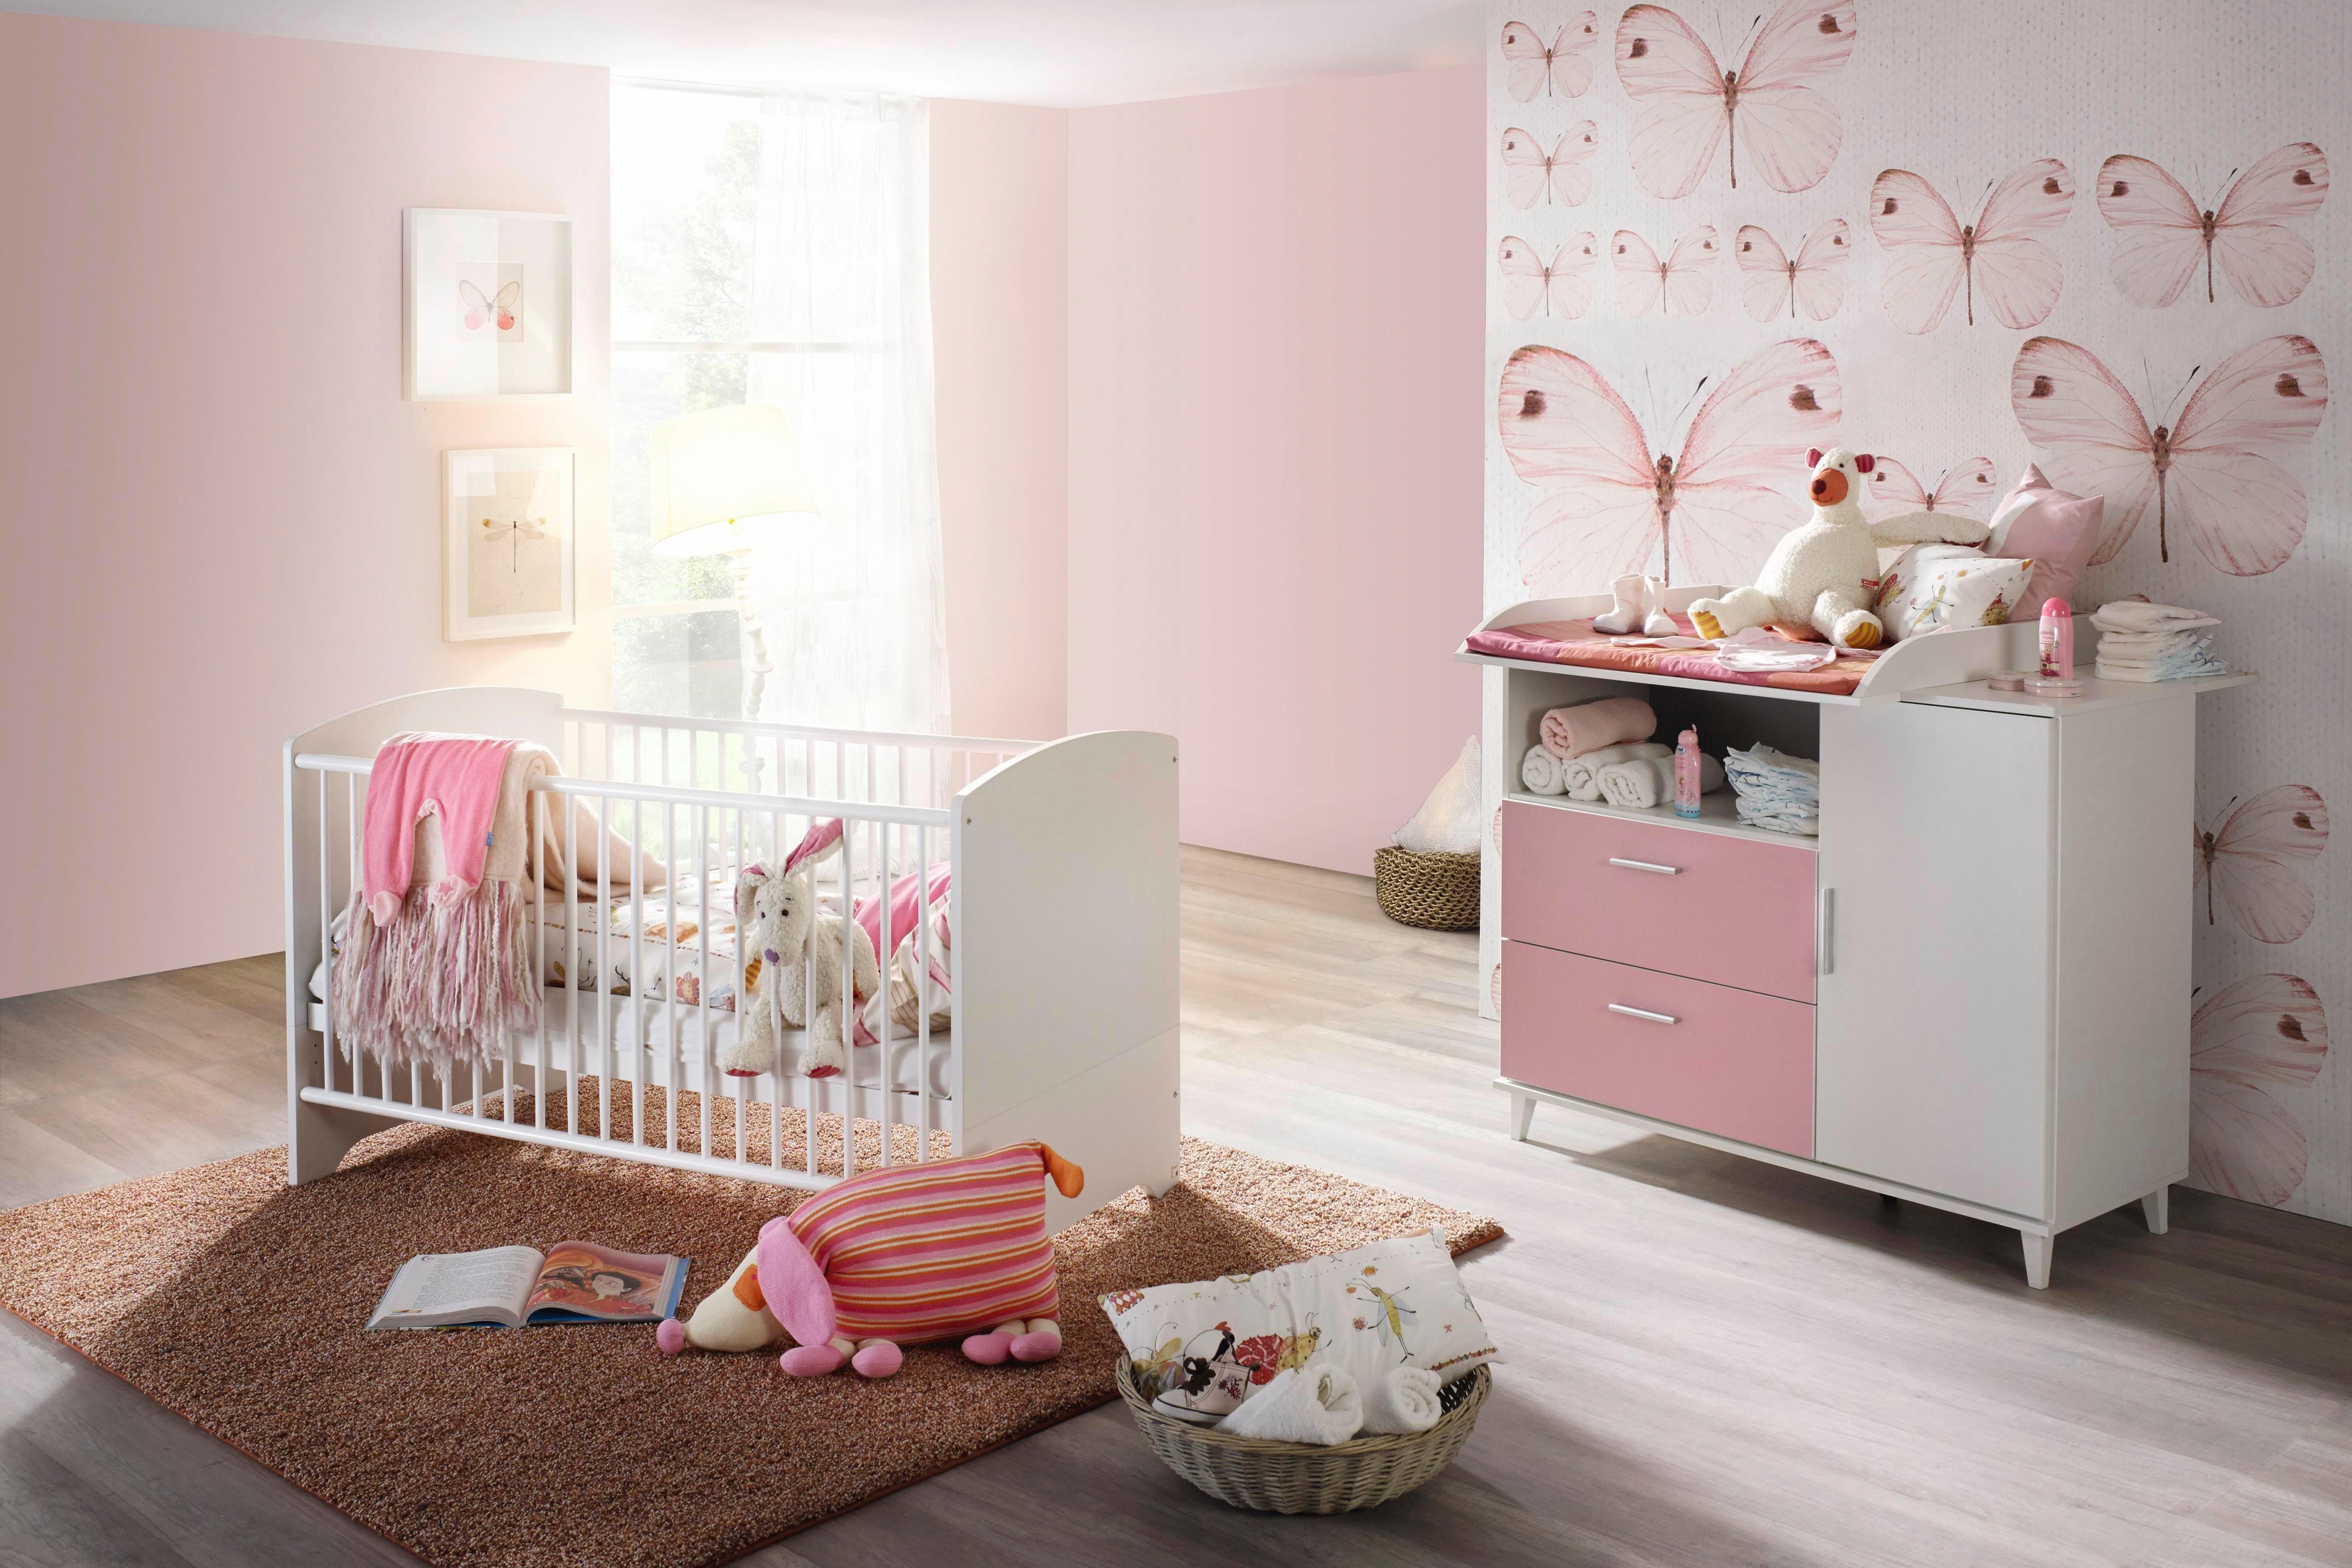 Babyzimmer Spar-Set »Nizza«, Babybett + Wickelkommode (2-tlg.) in rosa/ alpinweiß